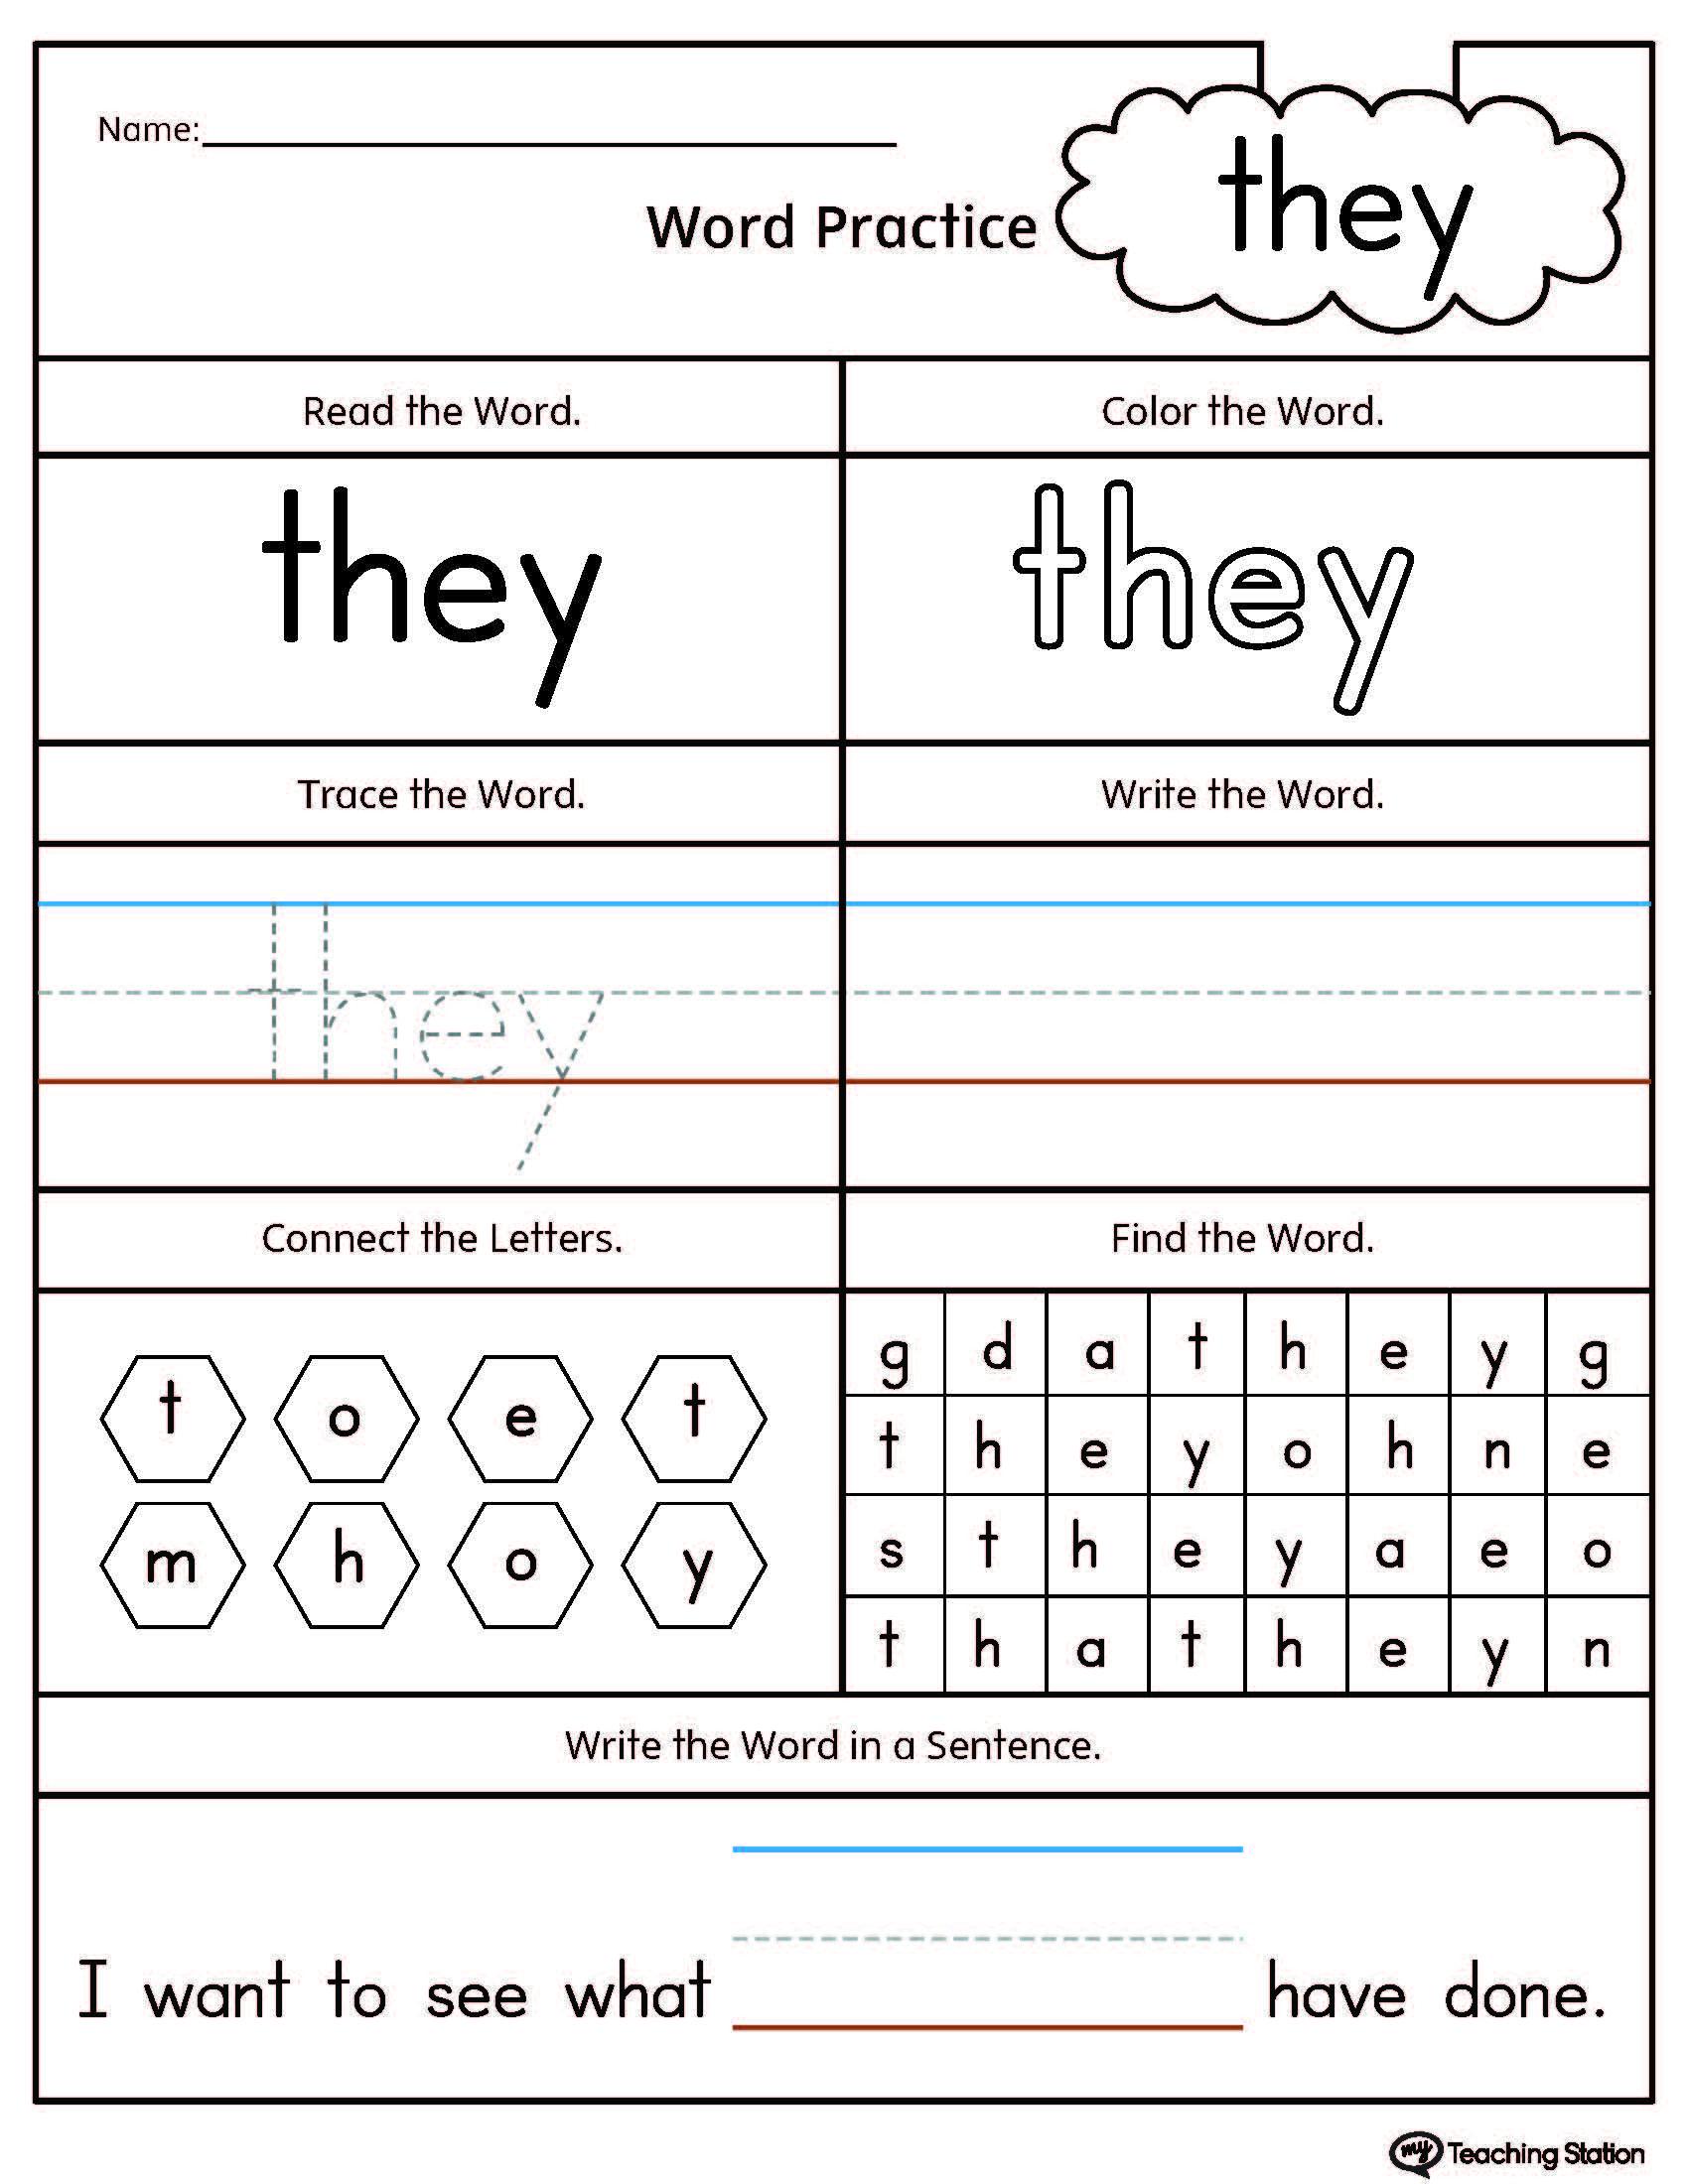 High Frequency Words Printable Worksheets | Kindergarten Sight Words | Homeschool Printable Worksheets Kindergarten